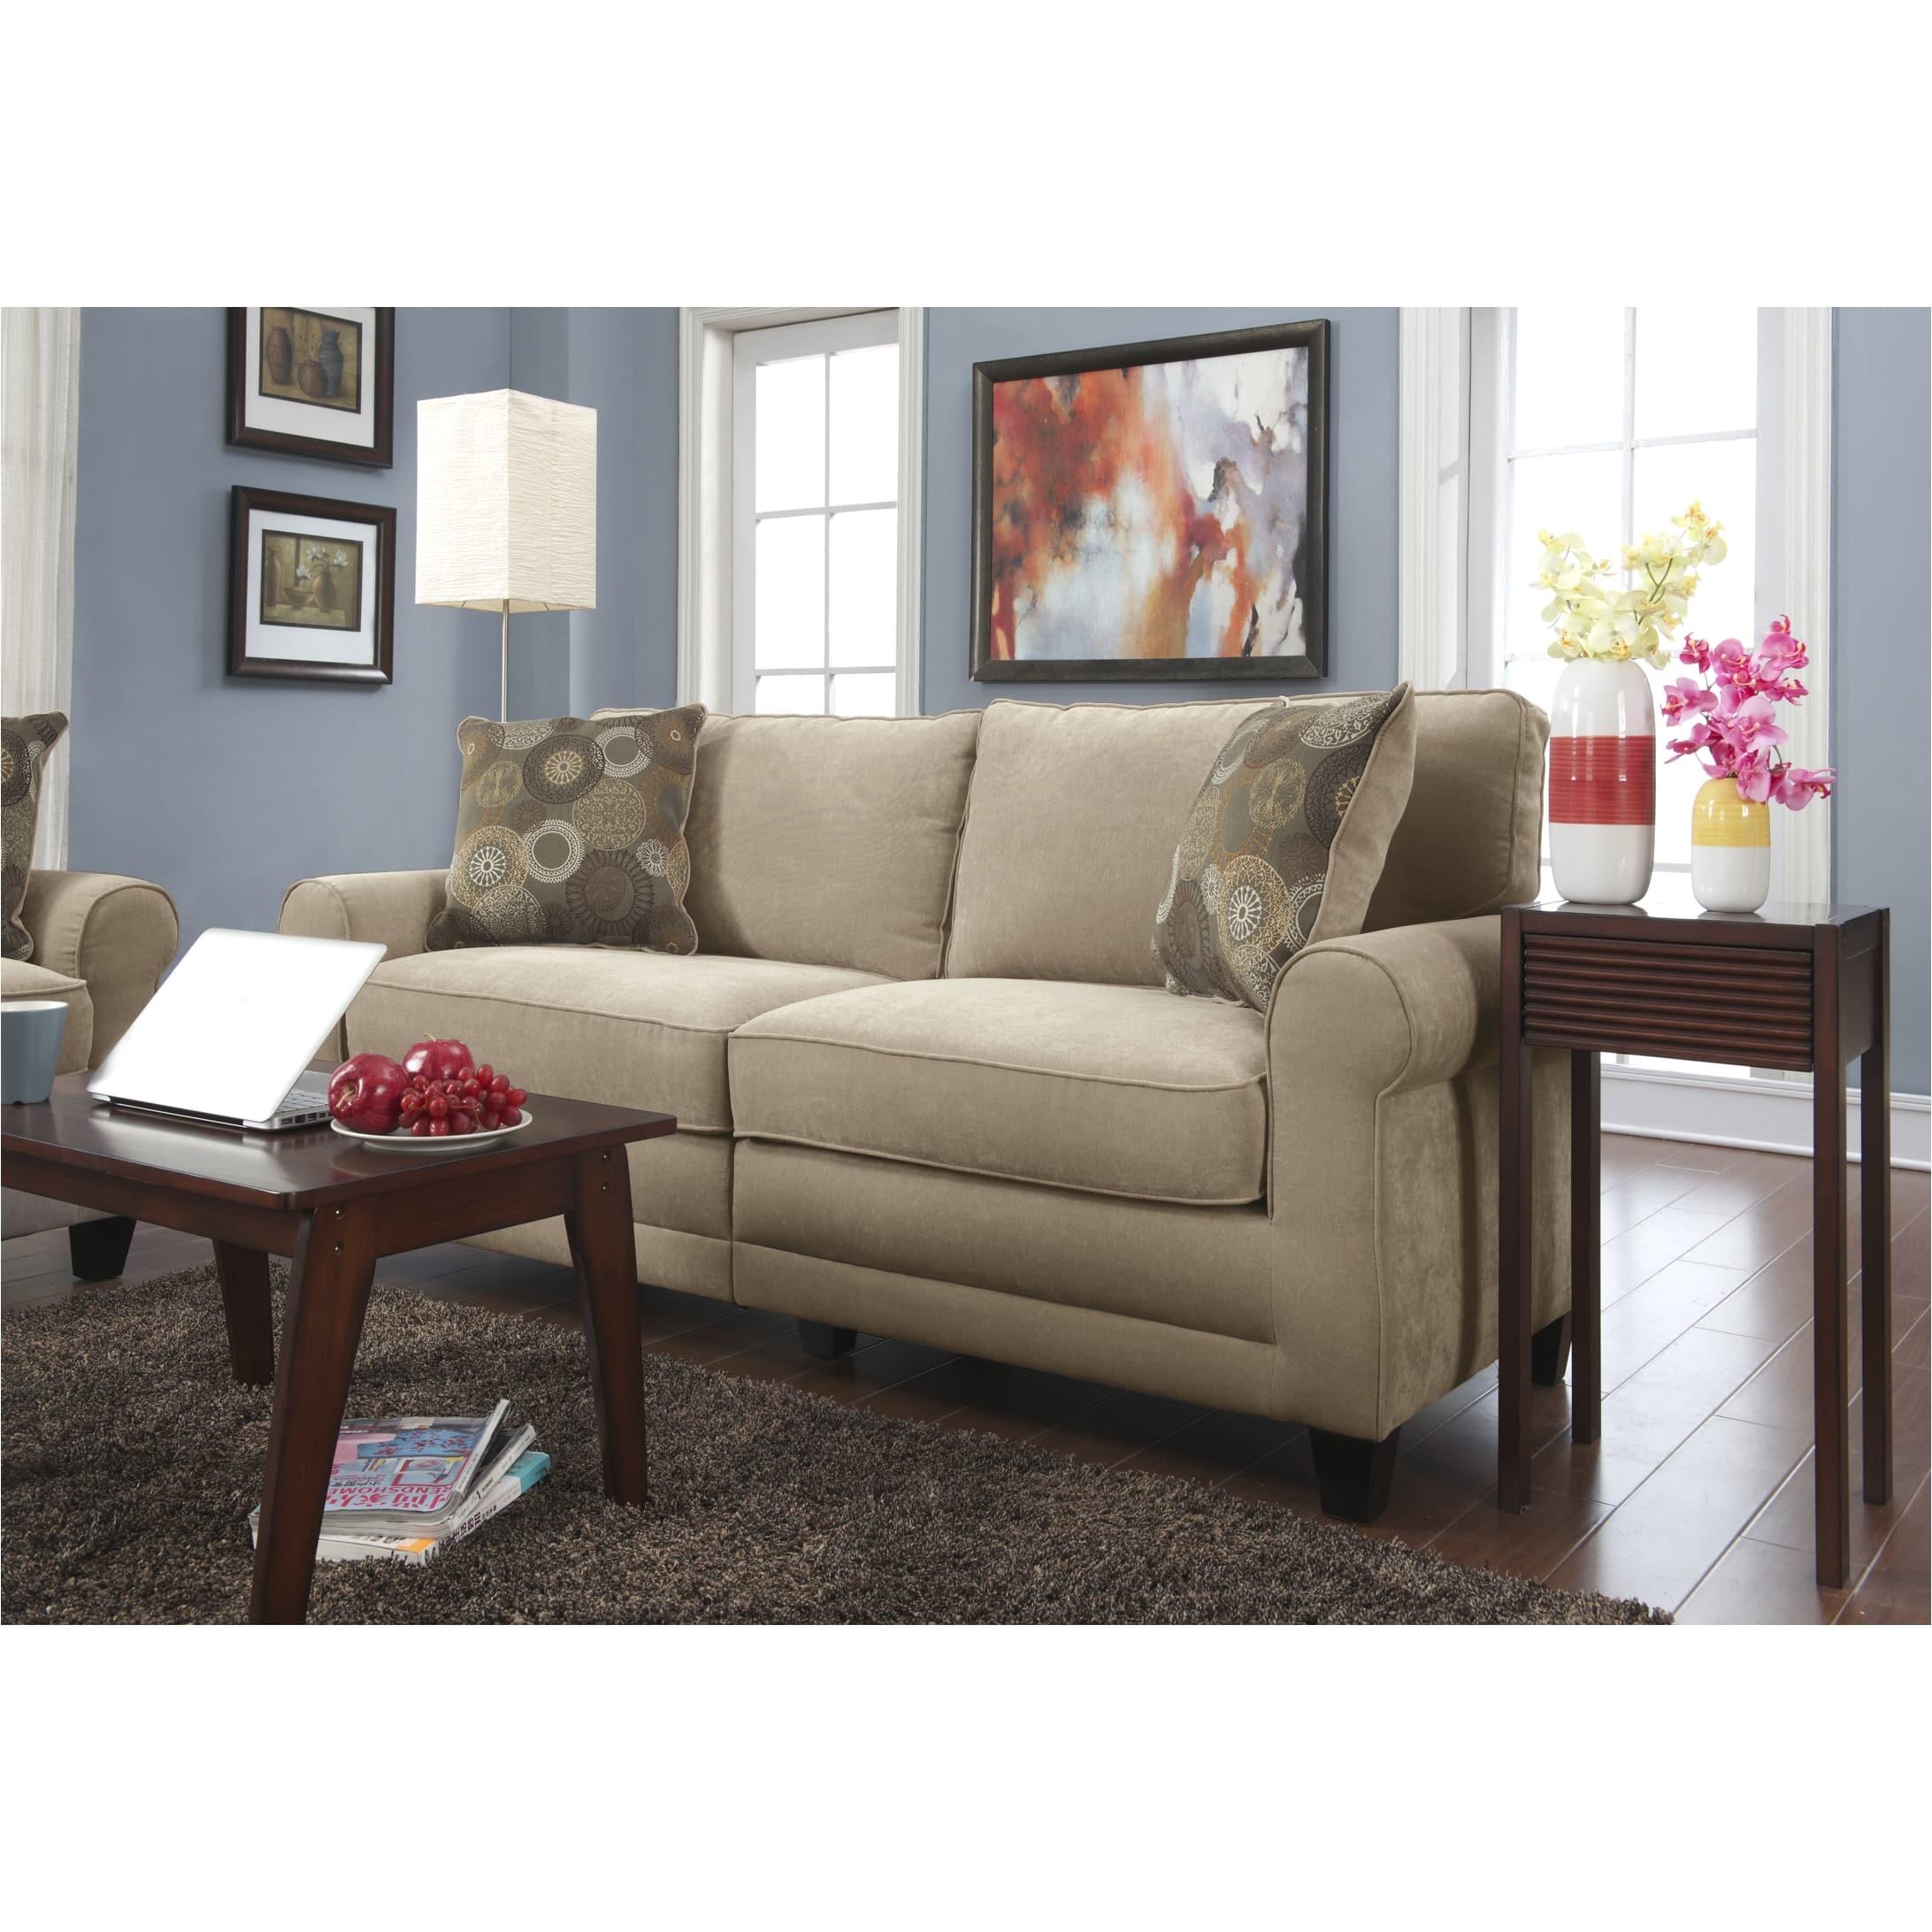 Early American Furniture sofas Shop Serta Rta Copenhagen Collection 78 Inch Vanity Fabric sofa